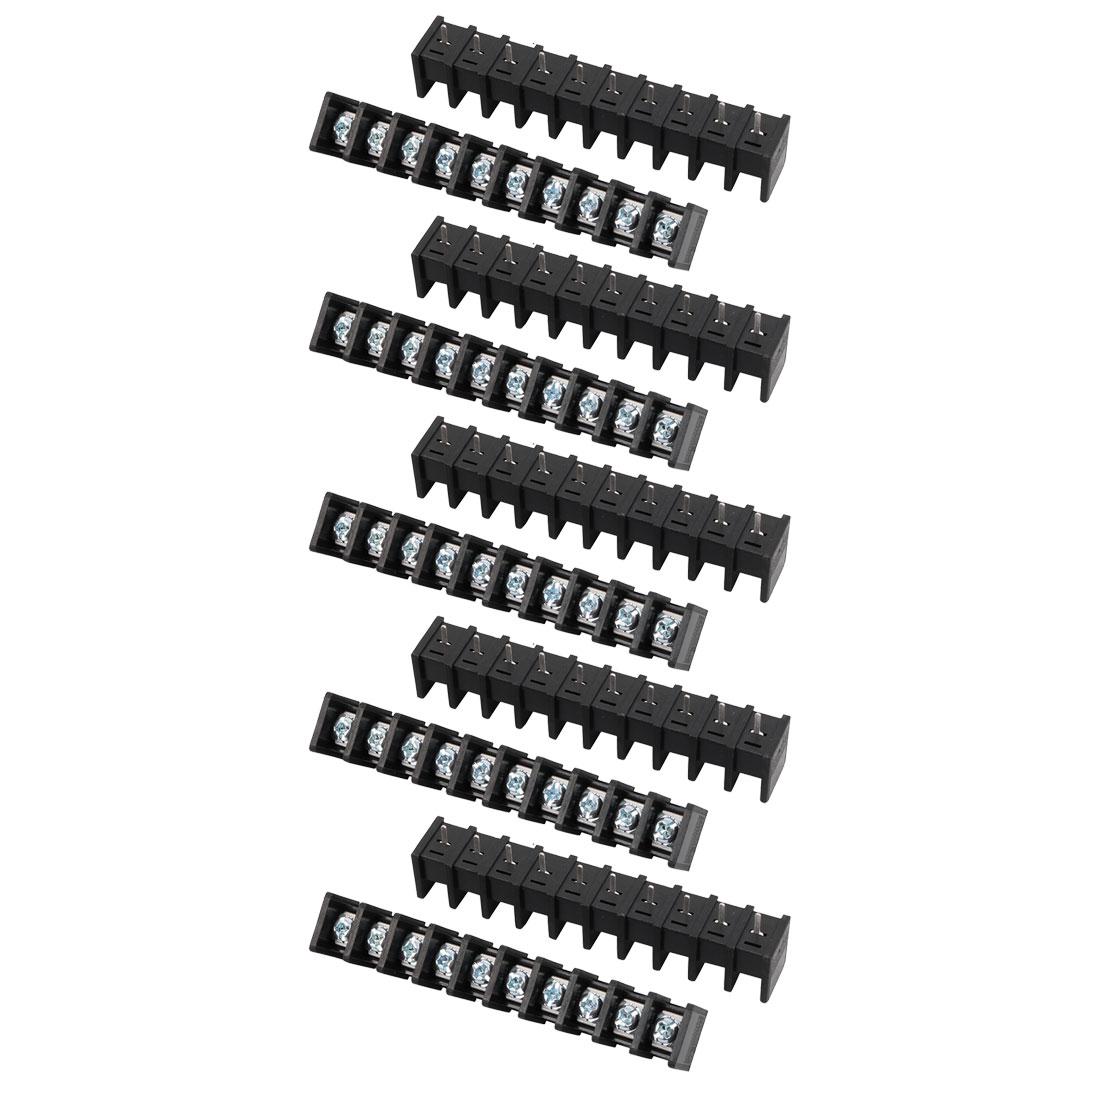 10Pcs LW1C AC 300V 20A 8.25mm Pitch 10P Screw Terminal Block Strip Barrier